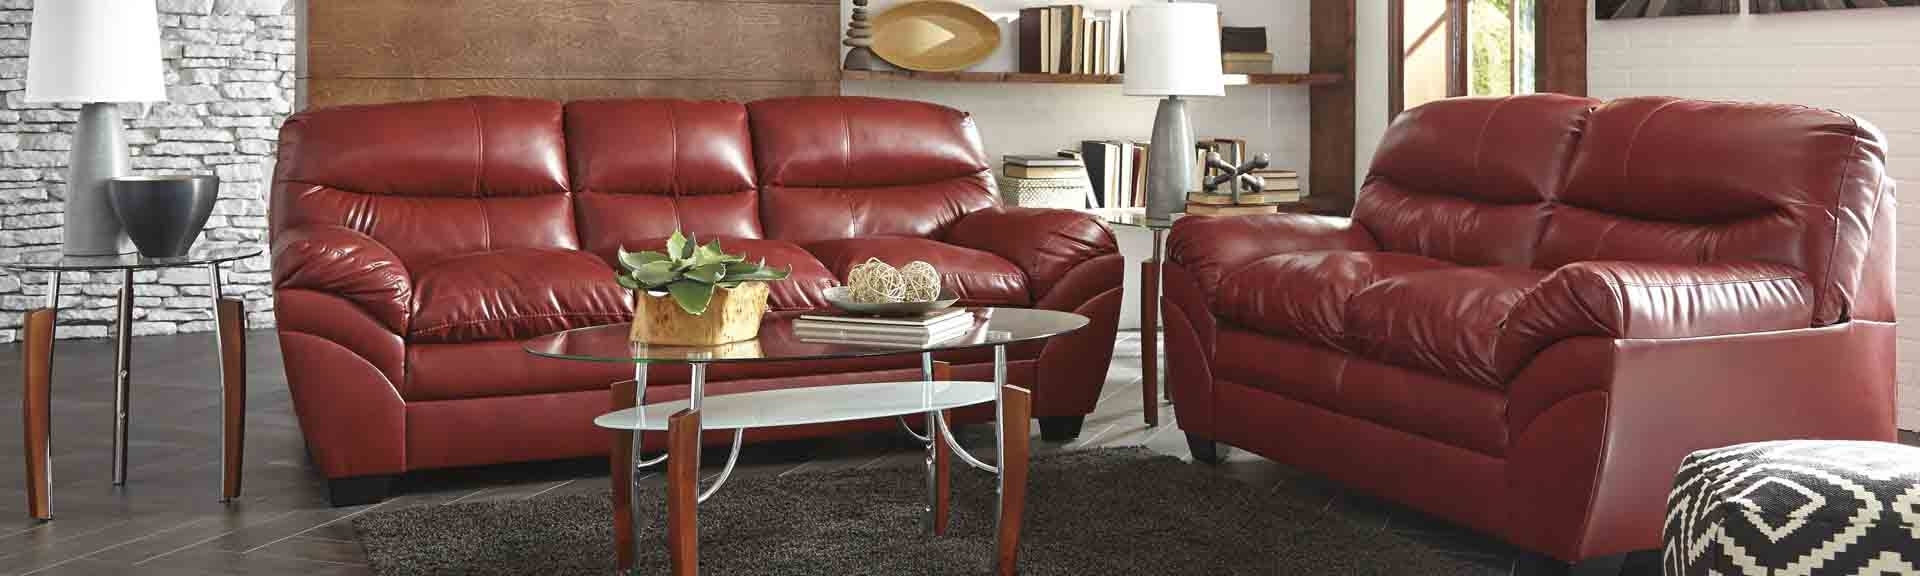 Living Room Furniture Phoenix Az Used Furniture Phoenix Mega Within Gilbert Az Sectional Sofas (Image 5 of 10)